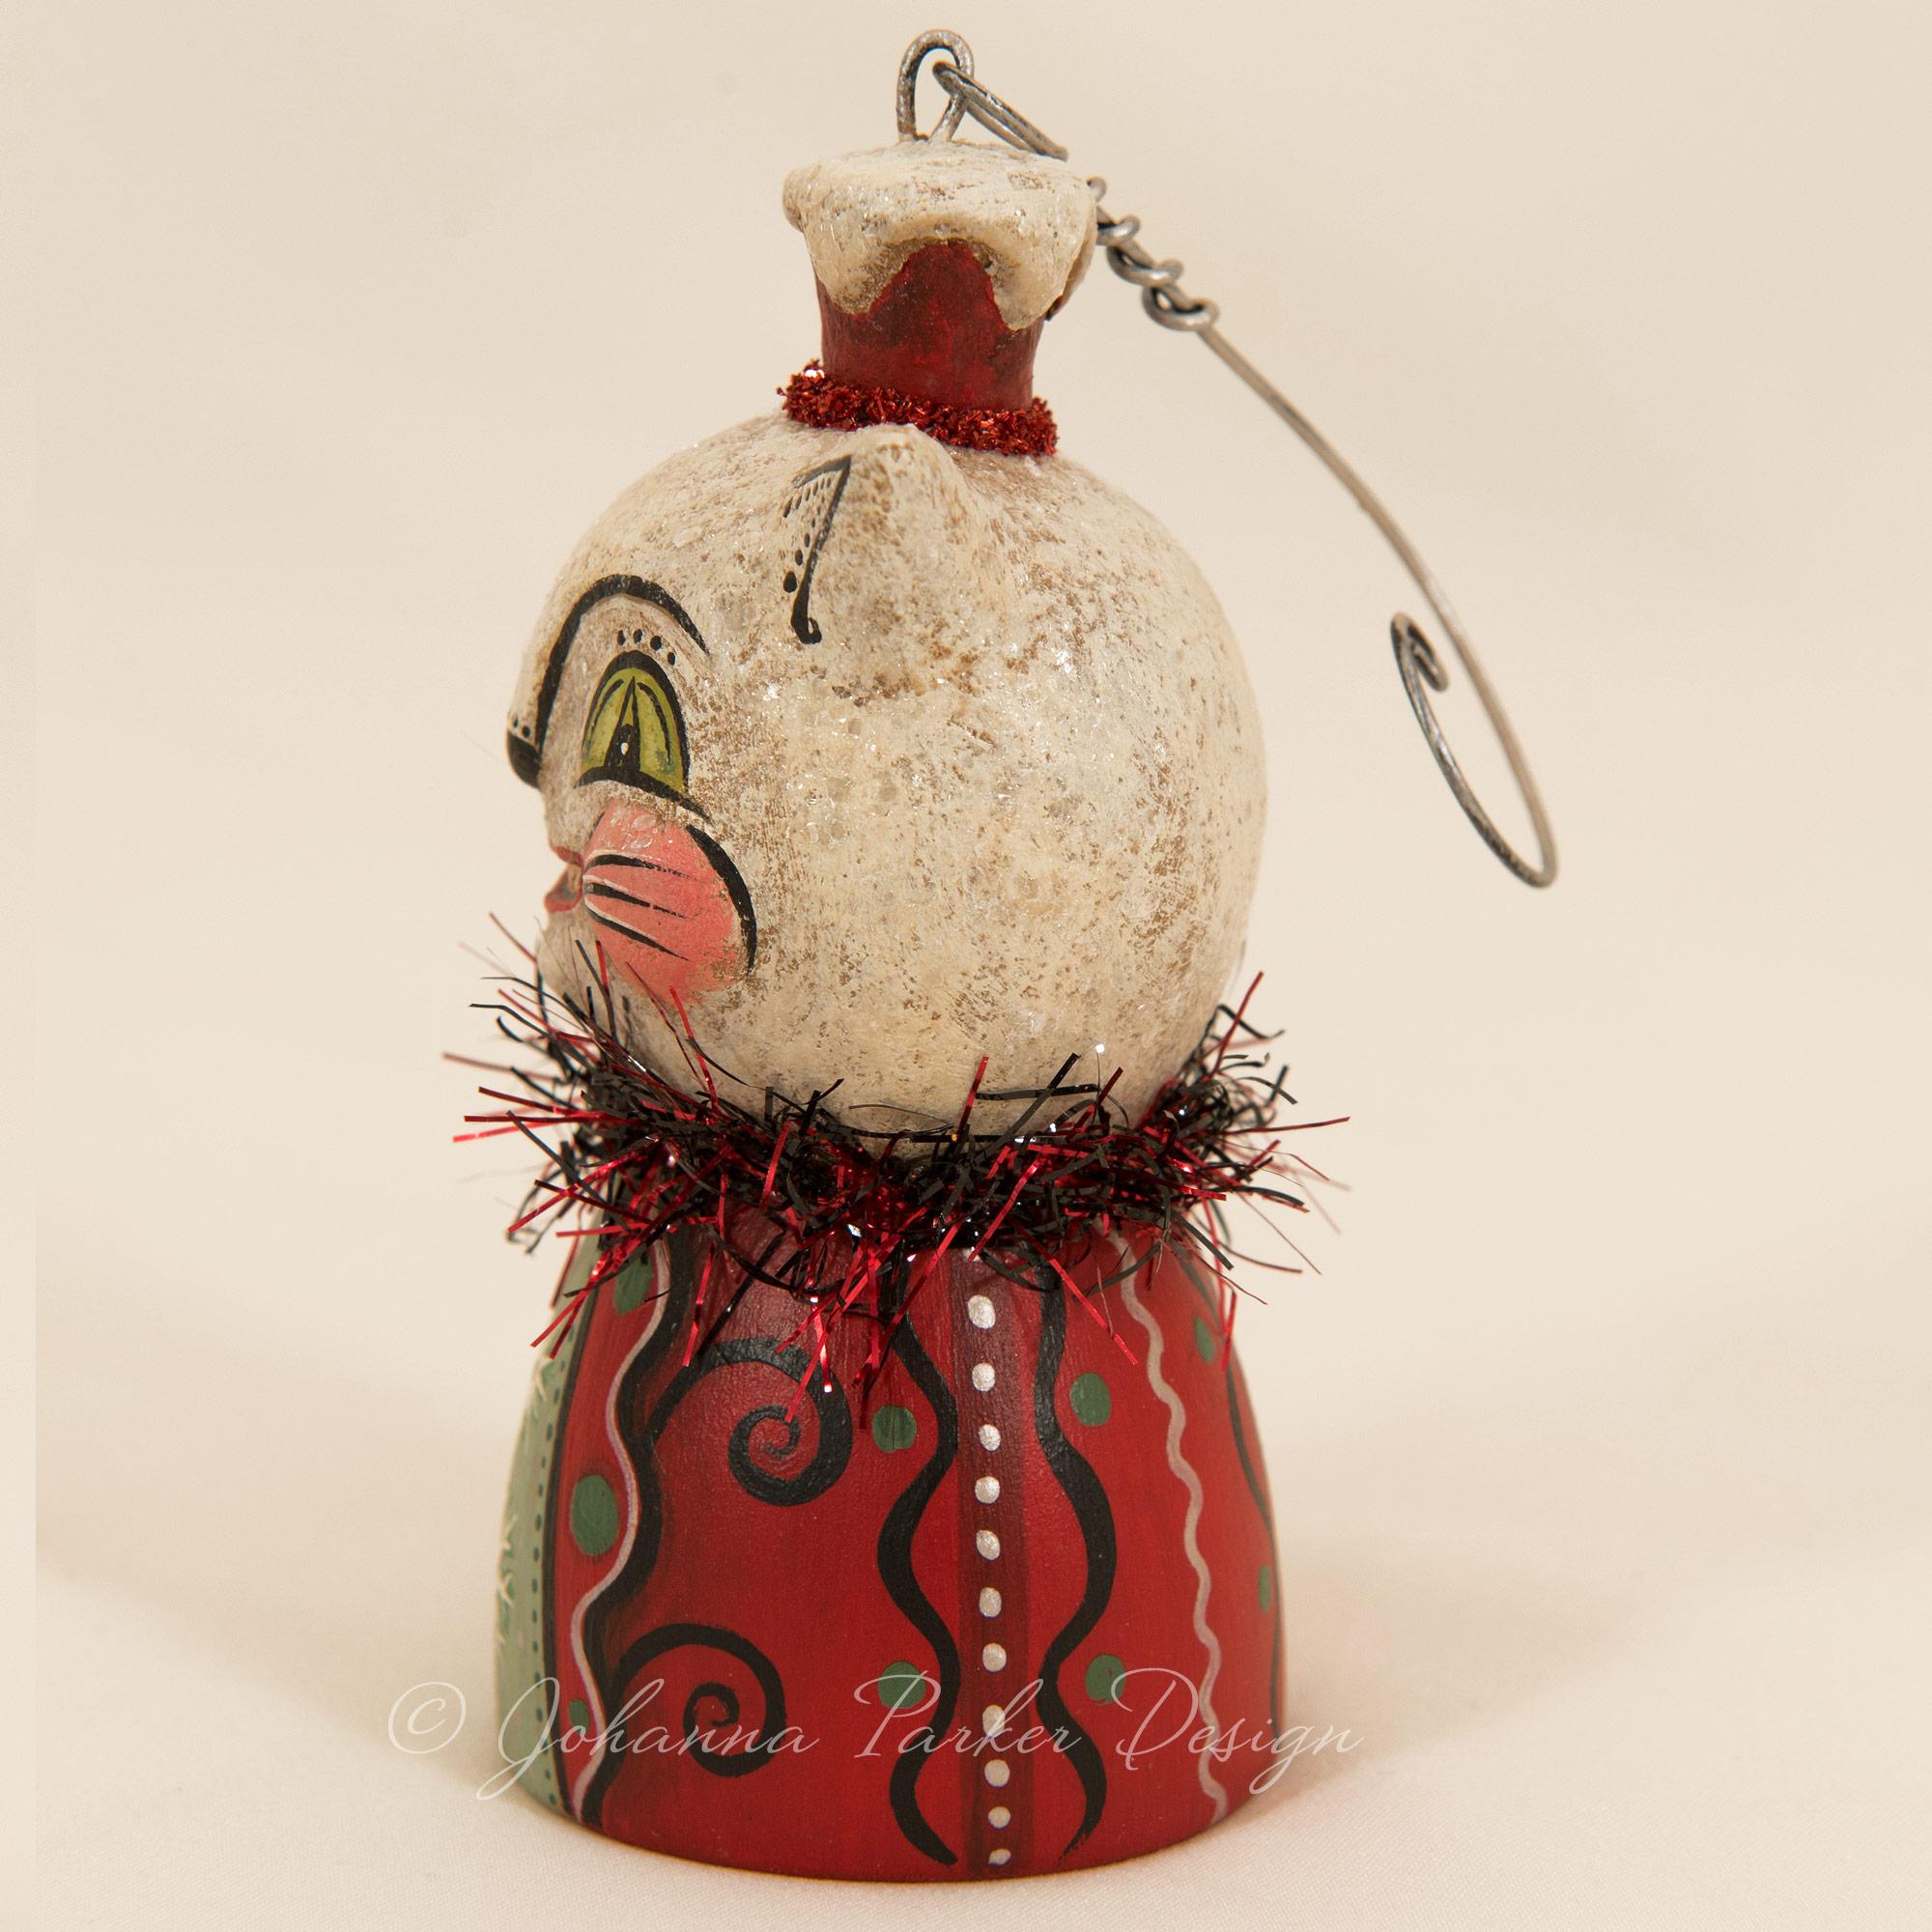 Johanna-Parker-Frosty-Grinning-Cat-Bell-Ornament-7.jpg